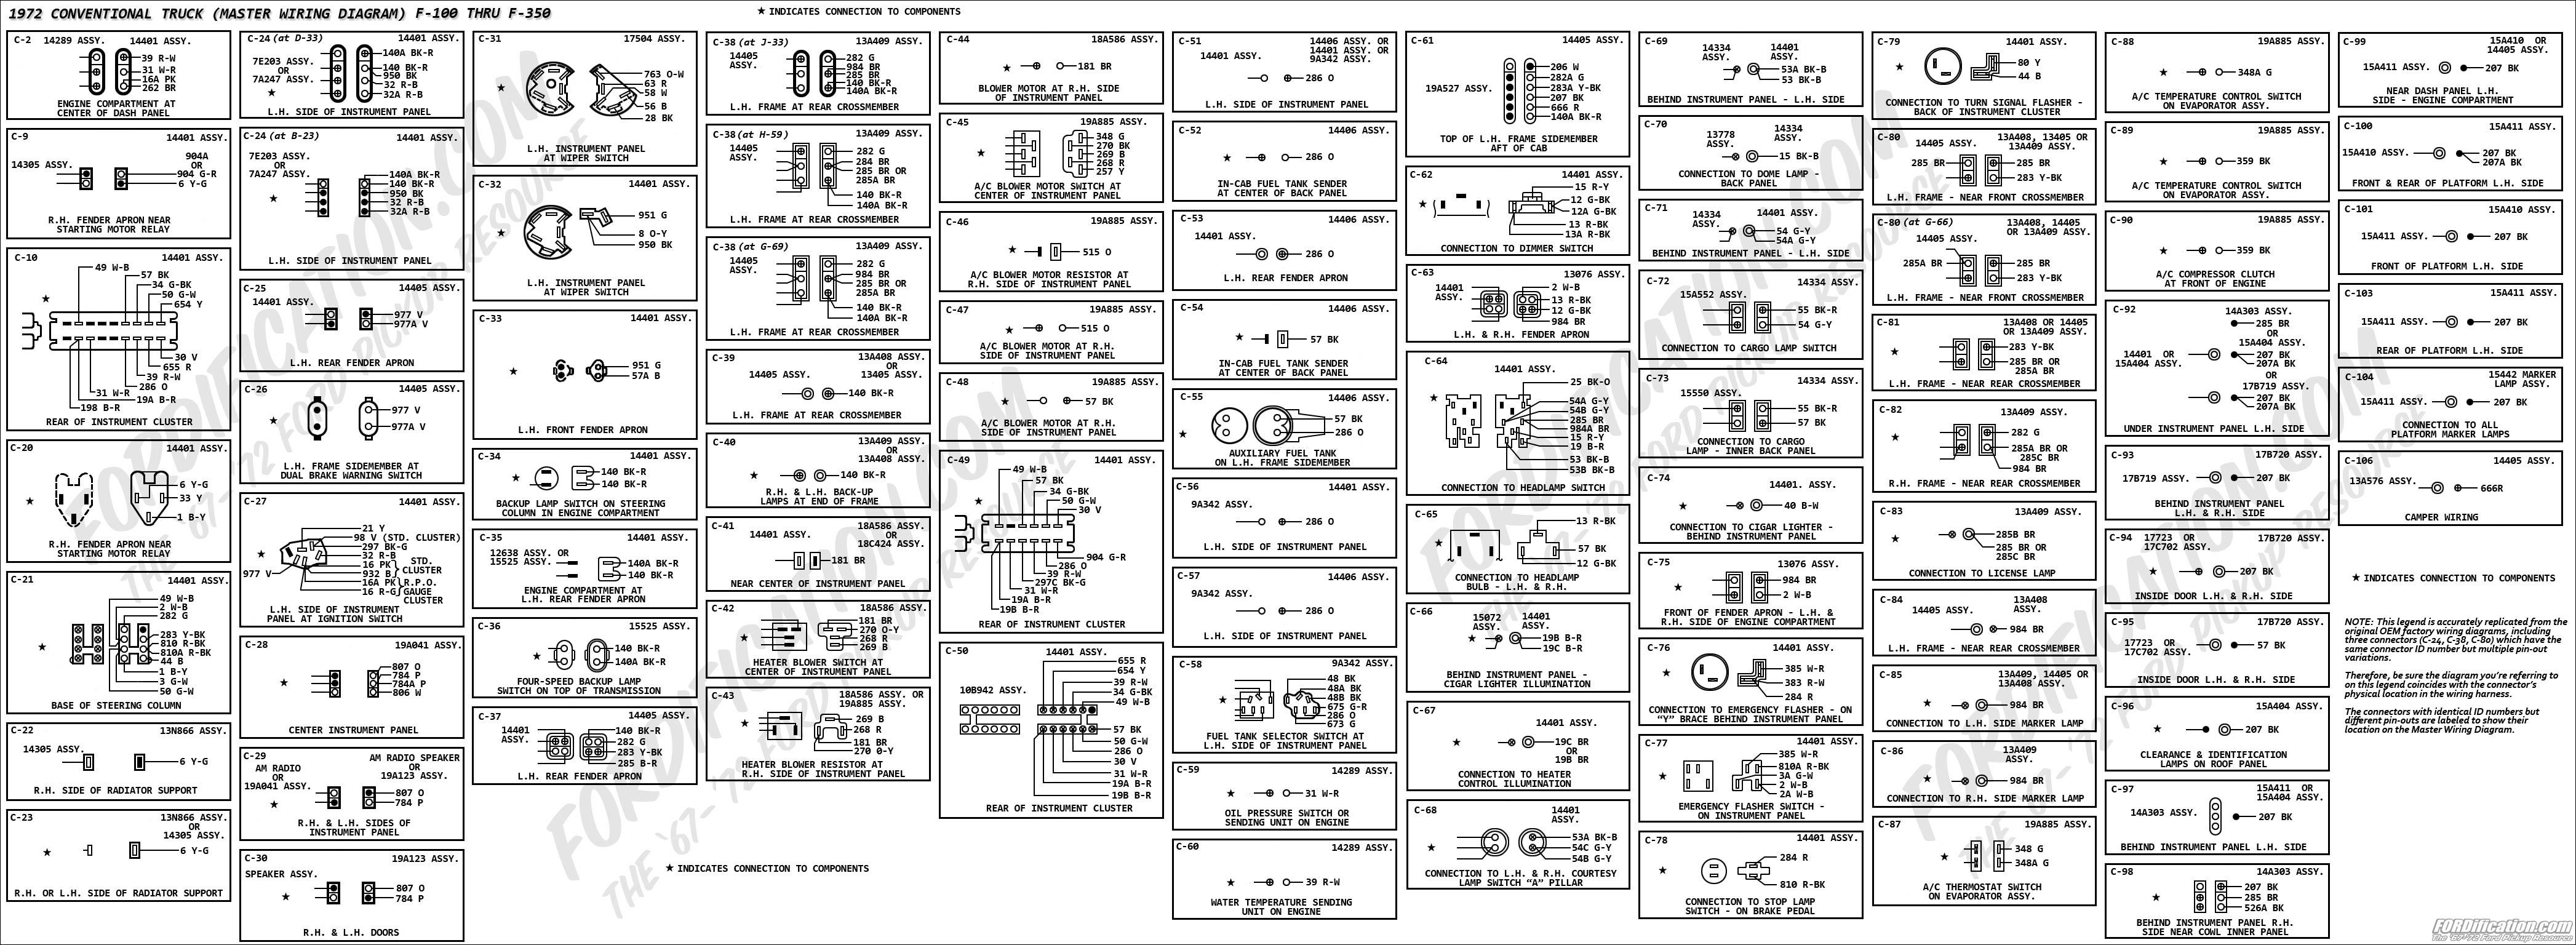 f100 yamaha fuel management gauge wiring diagram wiring diagram related posts to f100 yamaha fuel management gauge wiring diagram